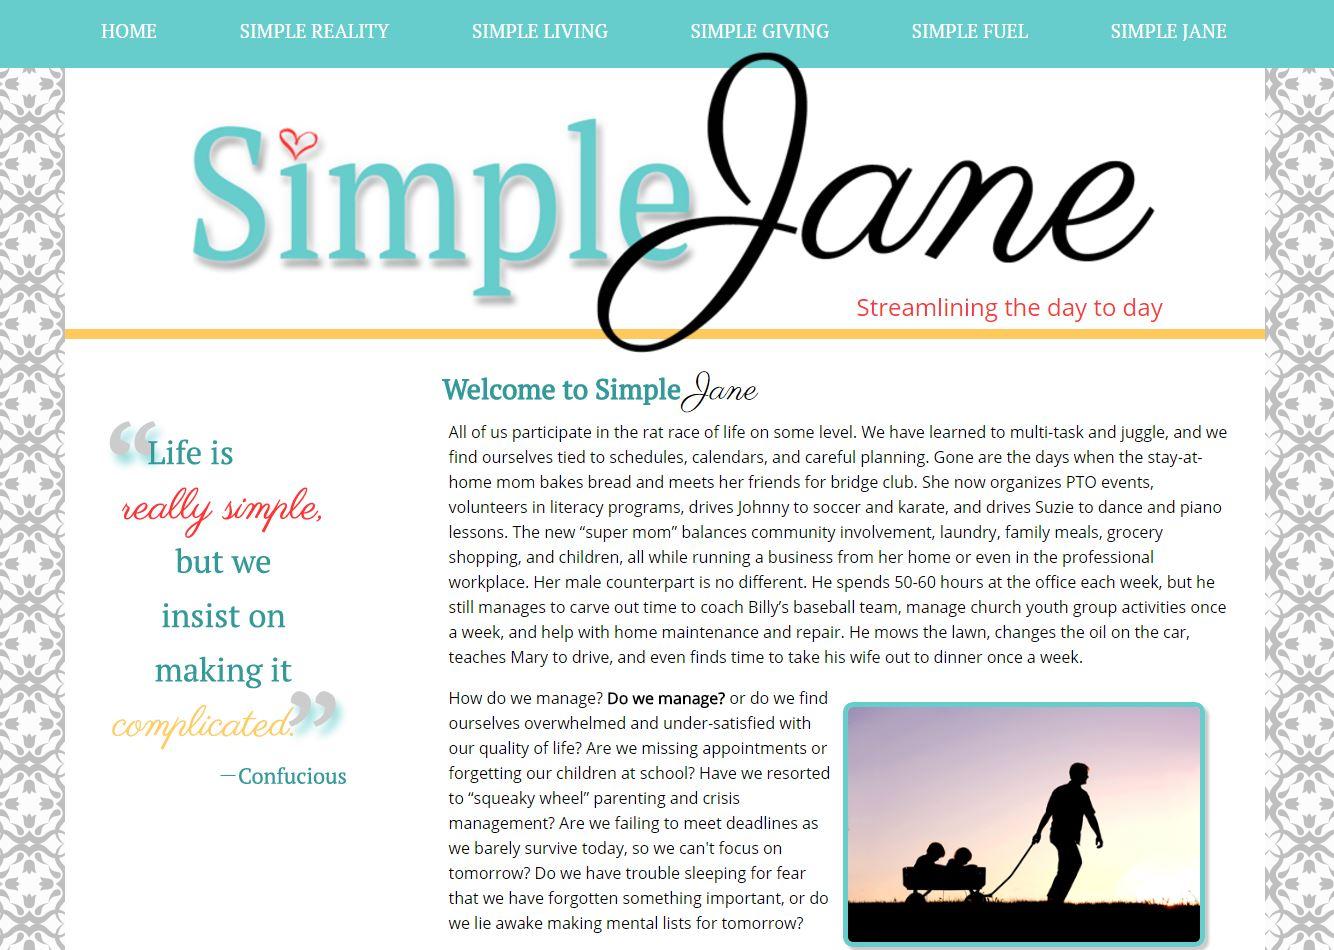 Simple Jane